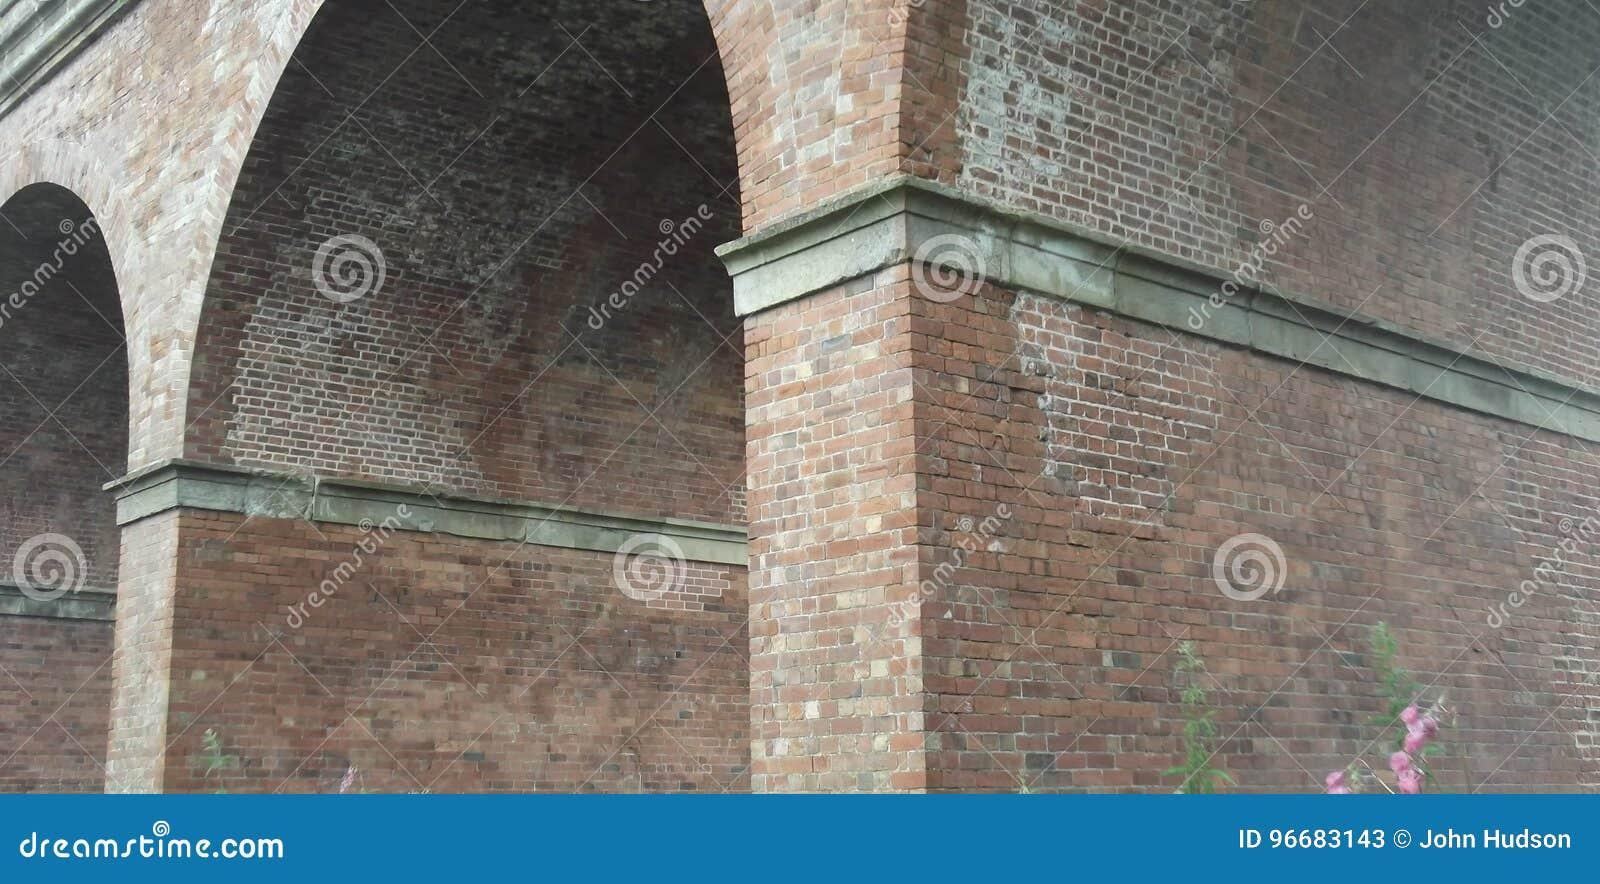 Ziegelsteinbögen eines Bahnviadukts